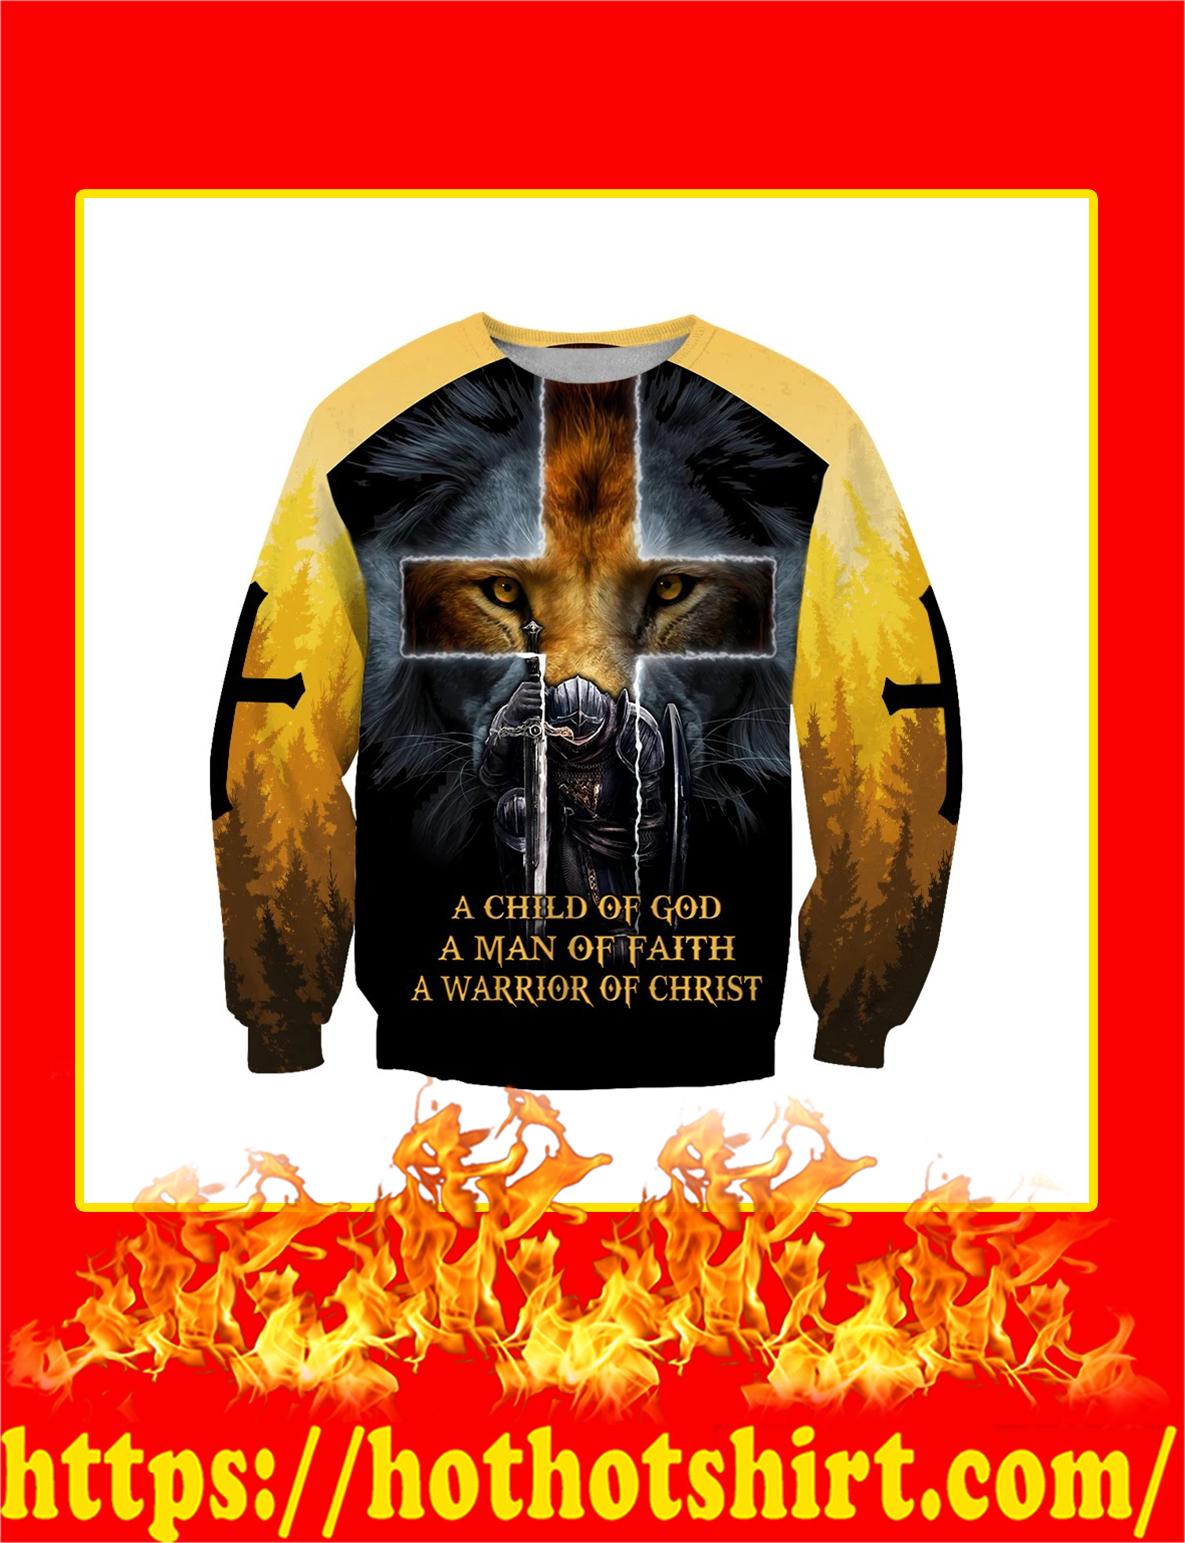 Knight Templar Jesus Lion A Child Of God 3D All Over Printed sweatshirt